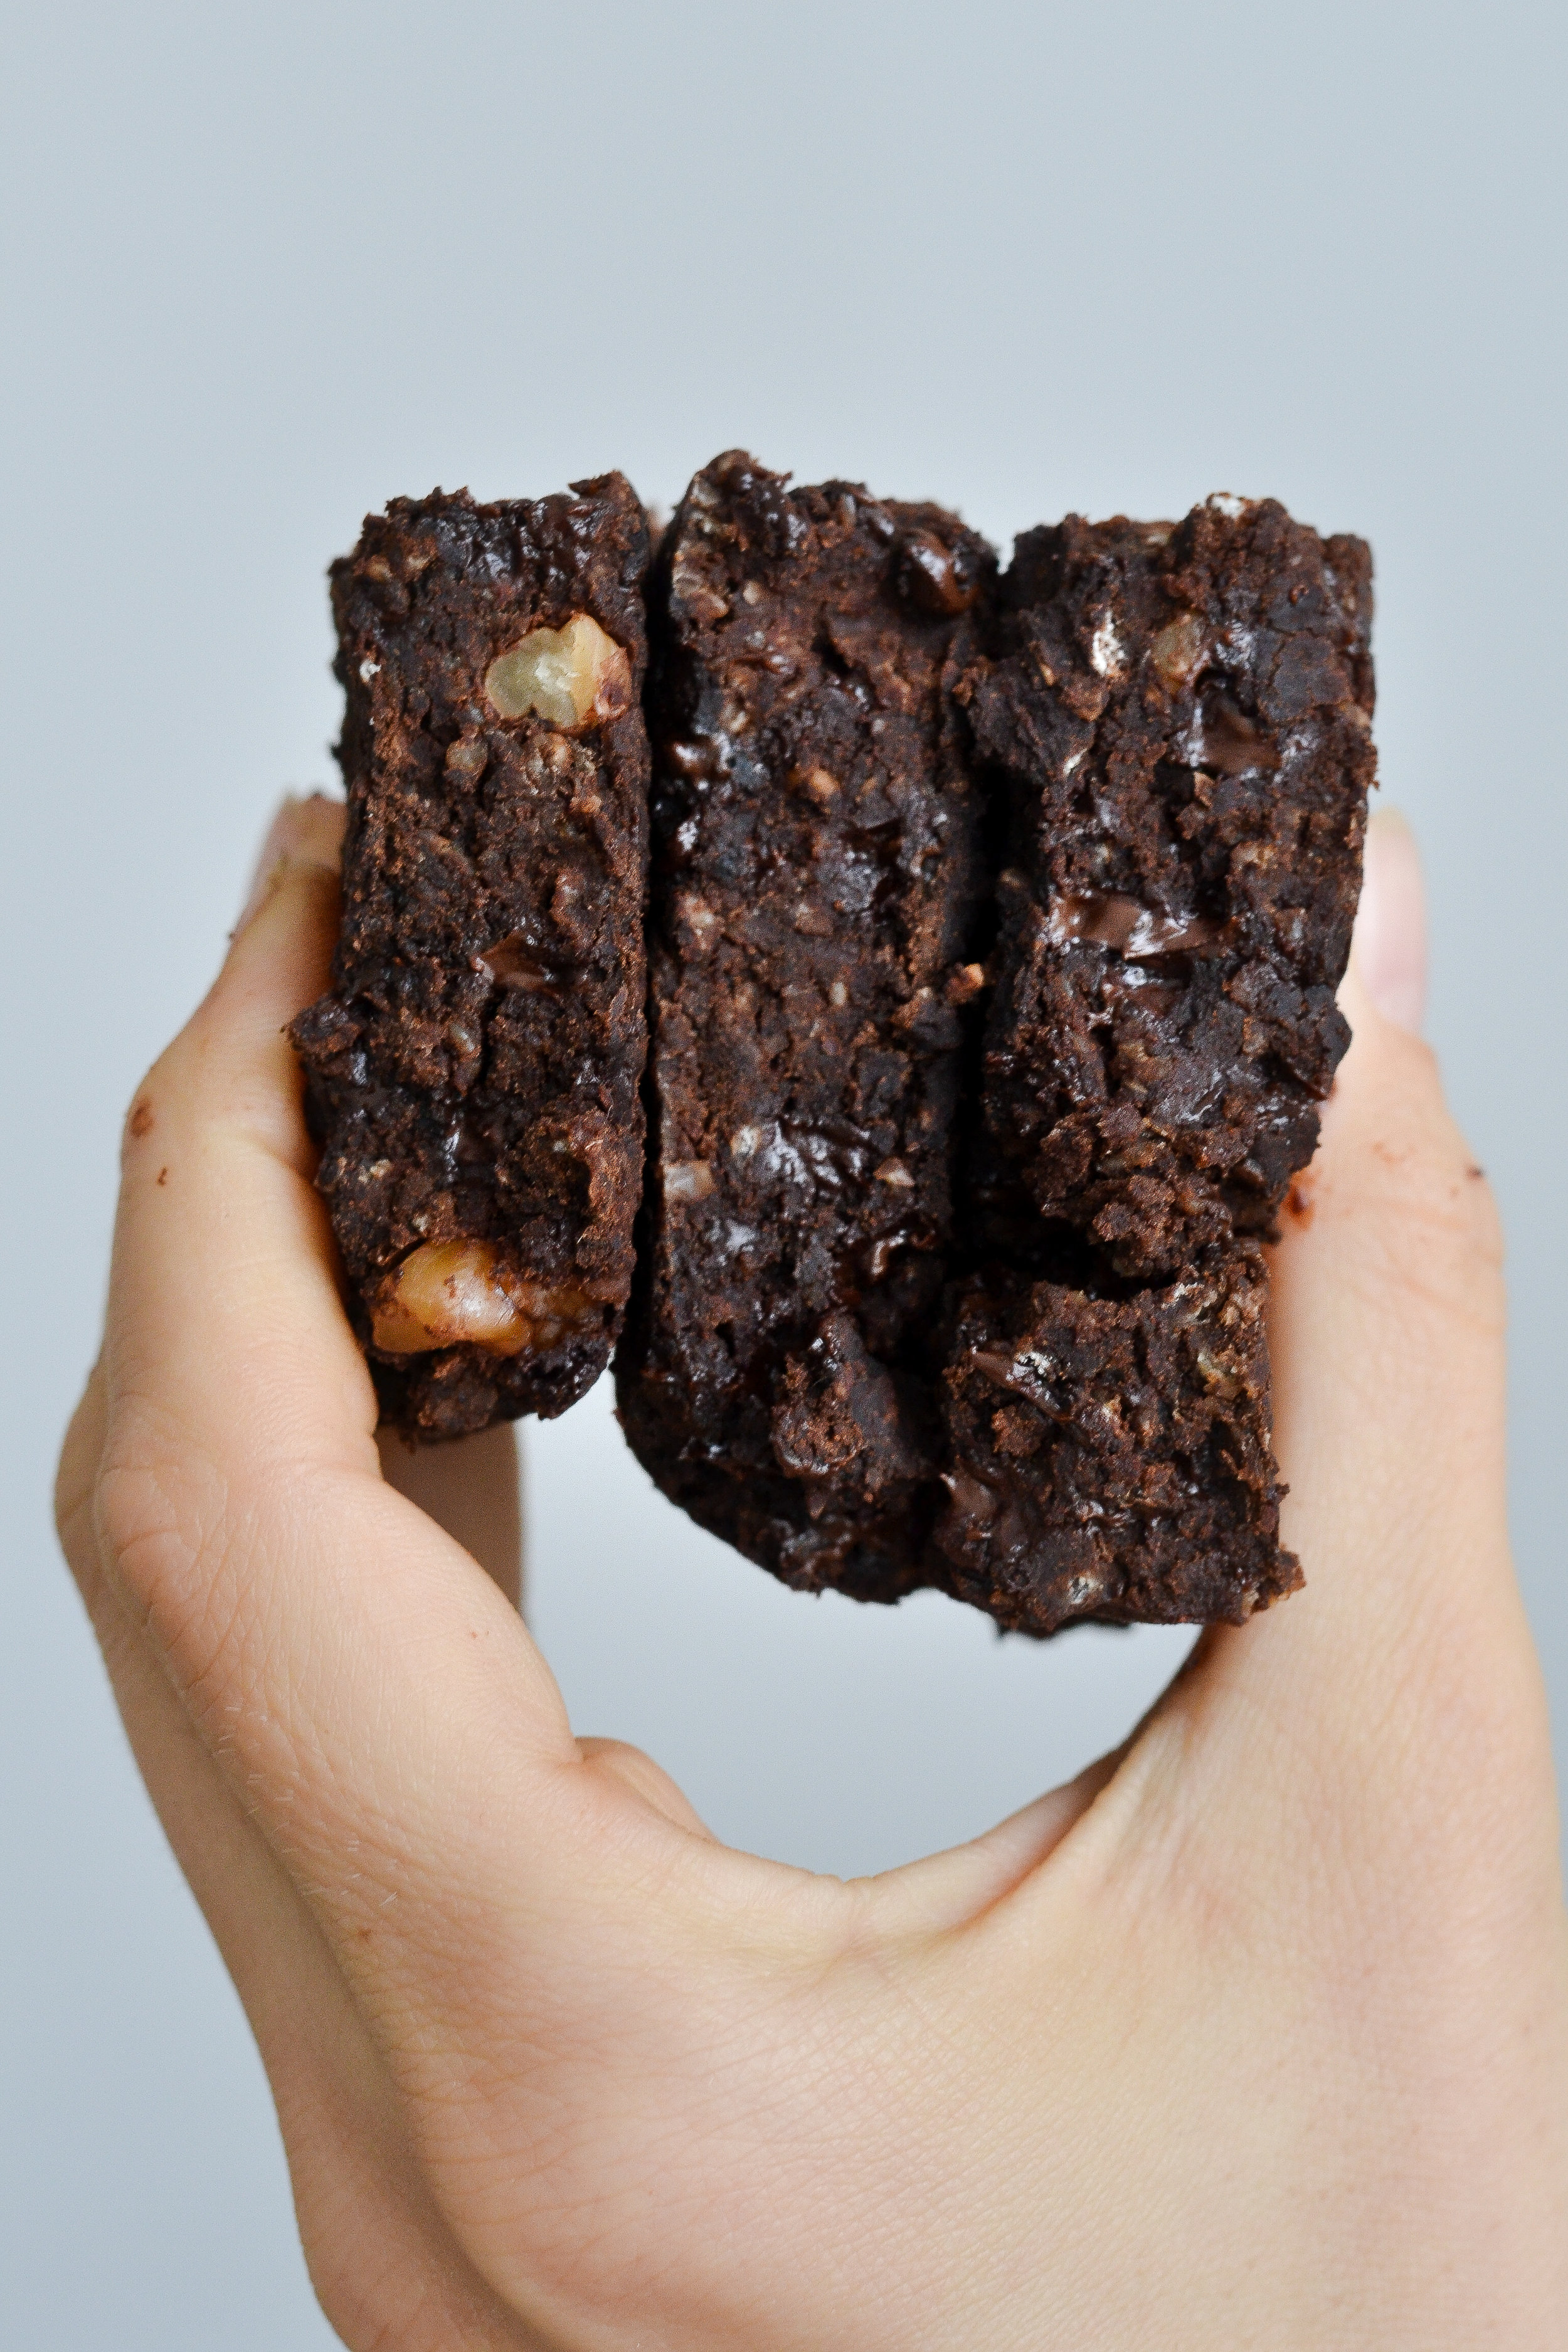 Plant-Based Vegan Brownies | Oil-Free, Gluten-Free, Wholesome Ingredients, easy to make recipe